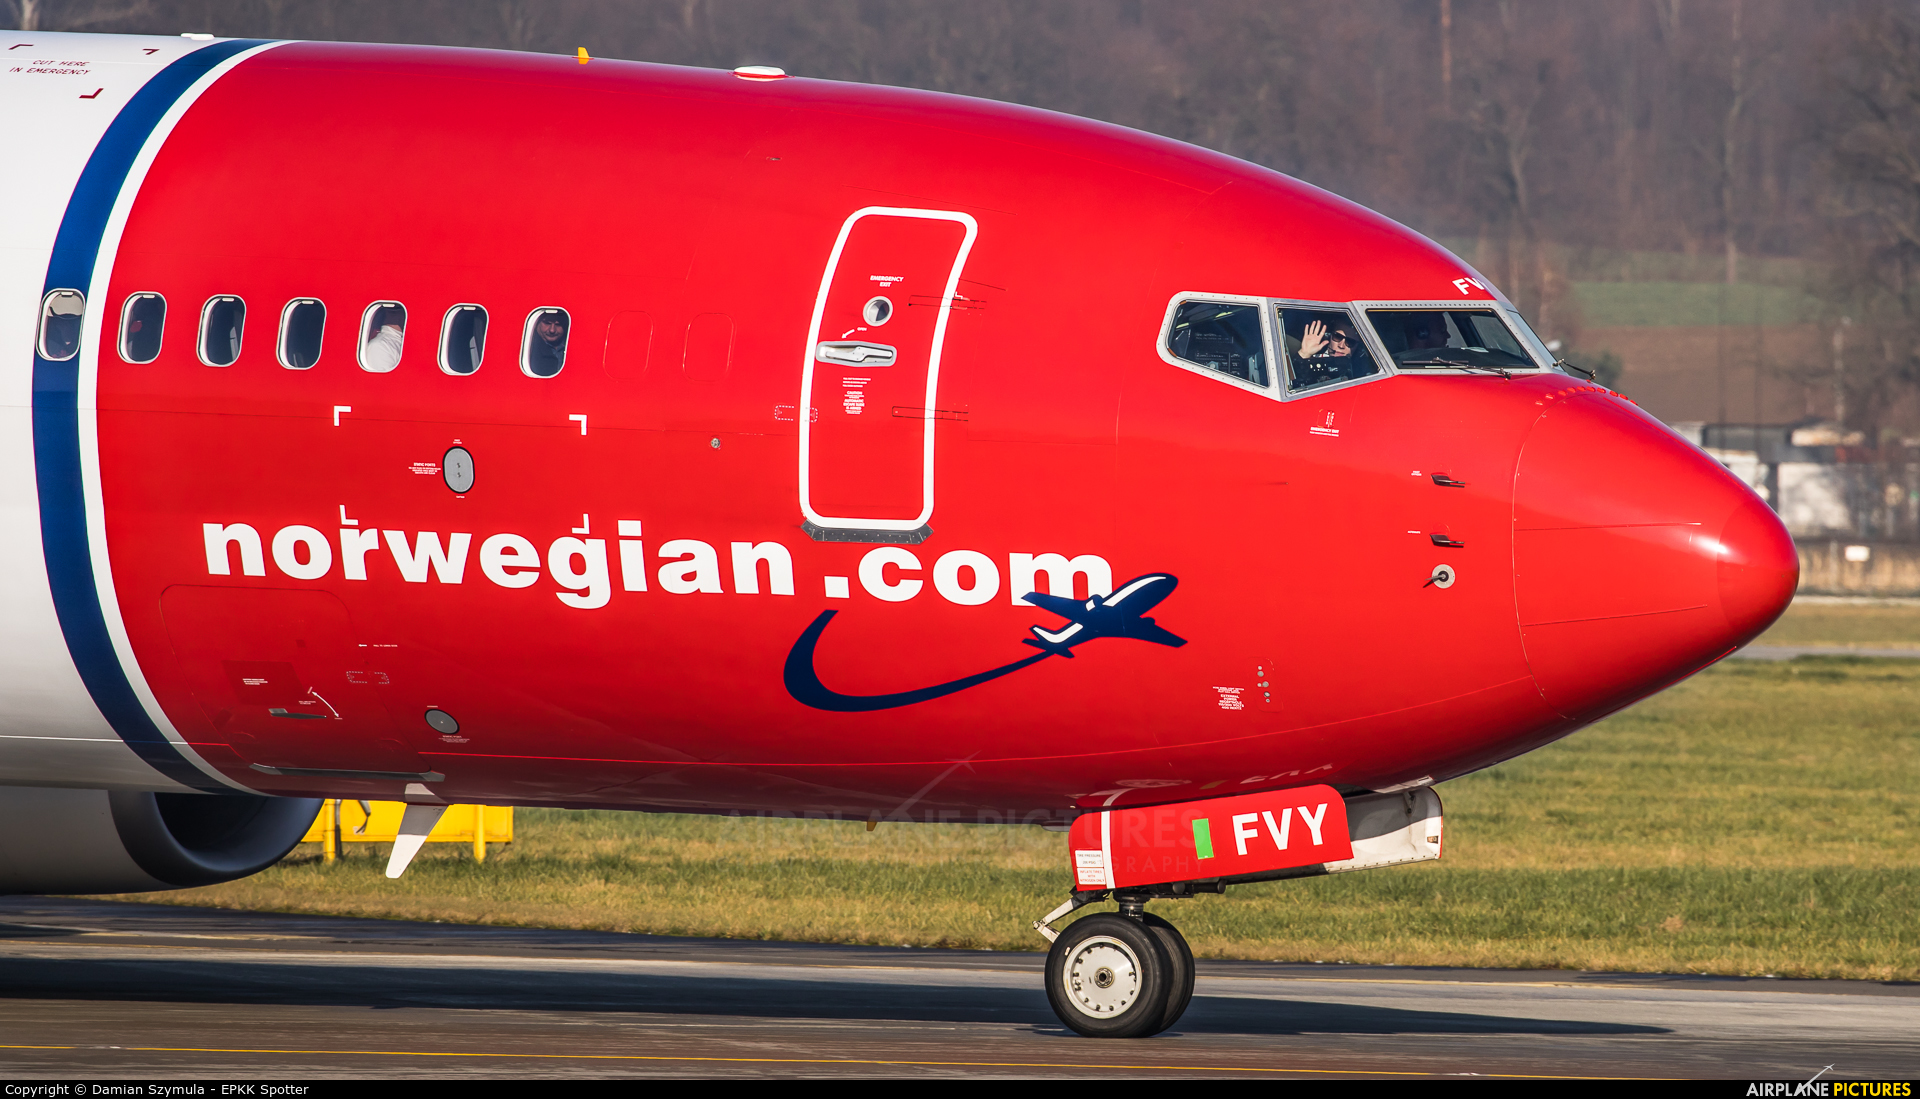 Norwegian Air International EI-FVY aircraft at Kraków - John Paul II Intl